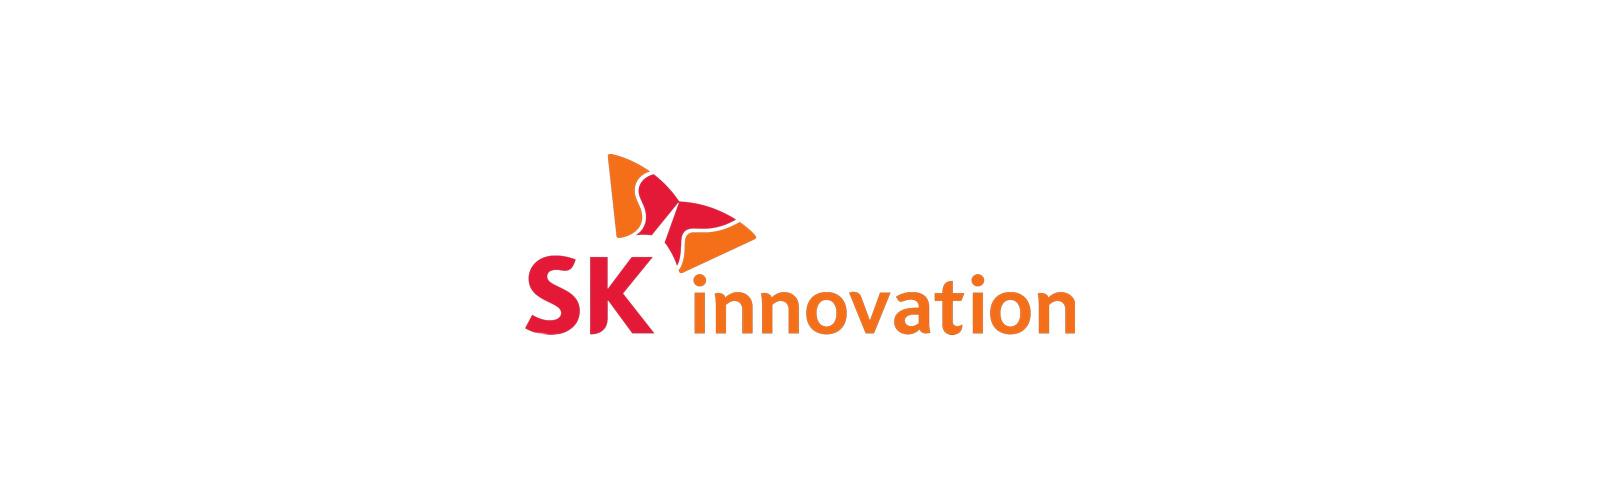 SK Innovation became the fifth largest EV battery supplier in April